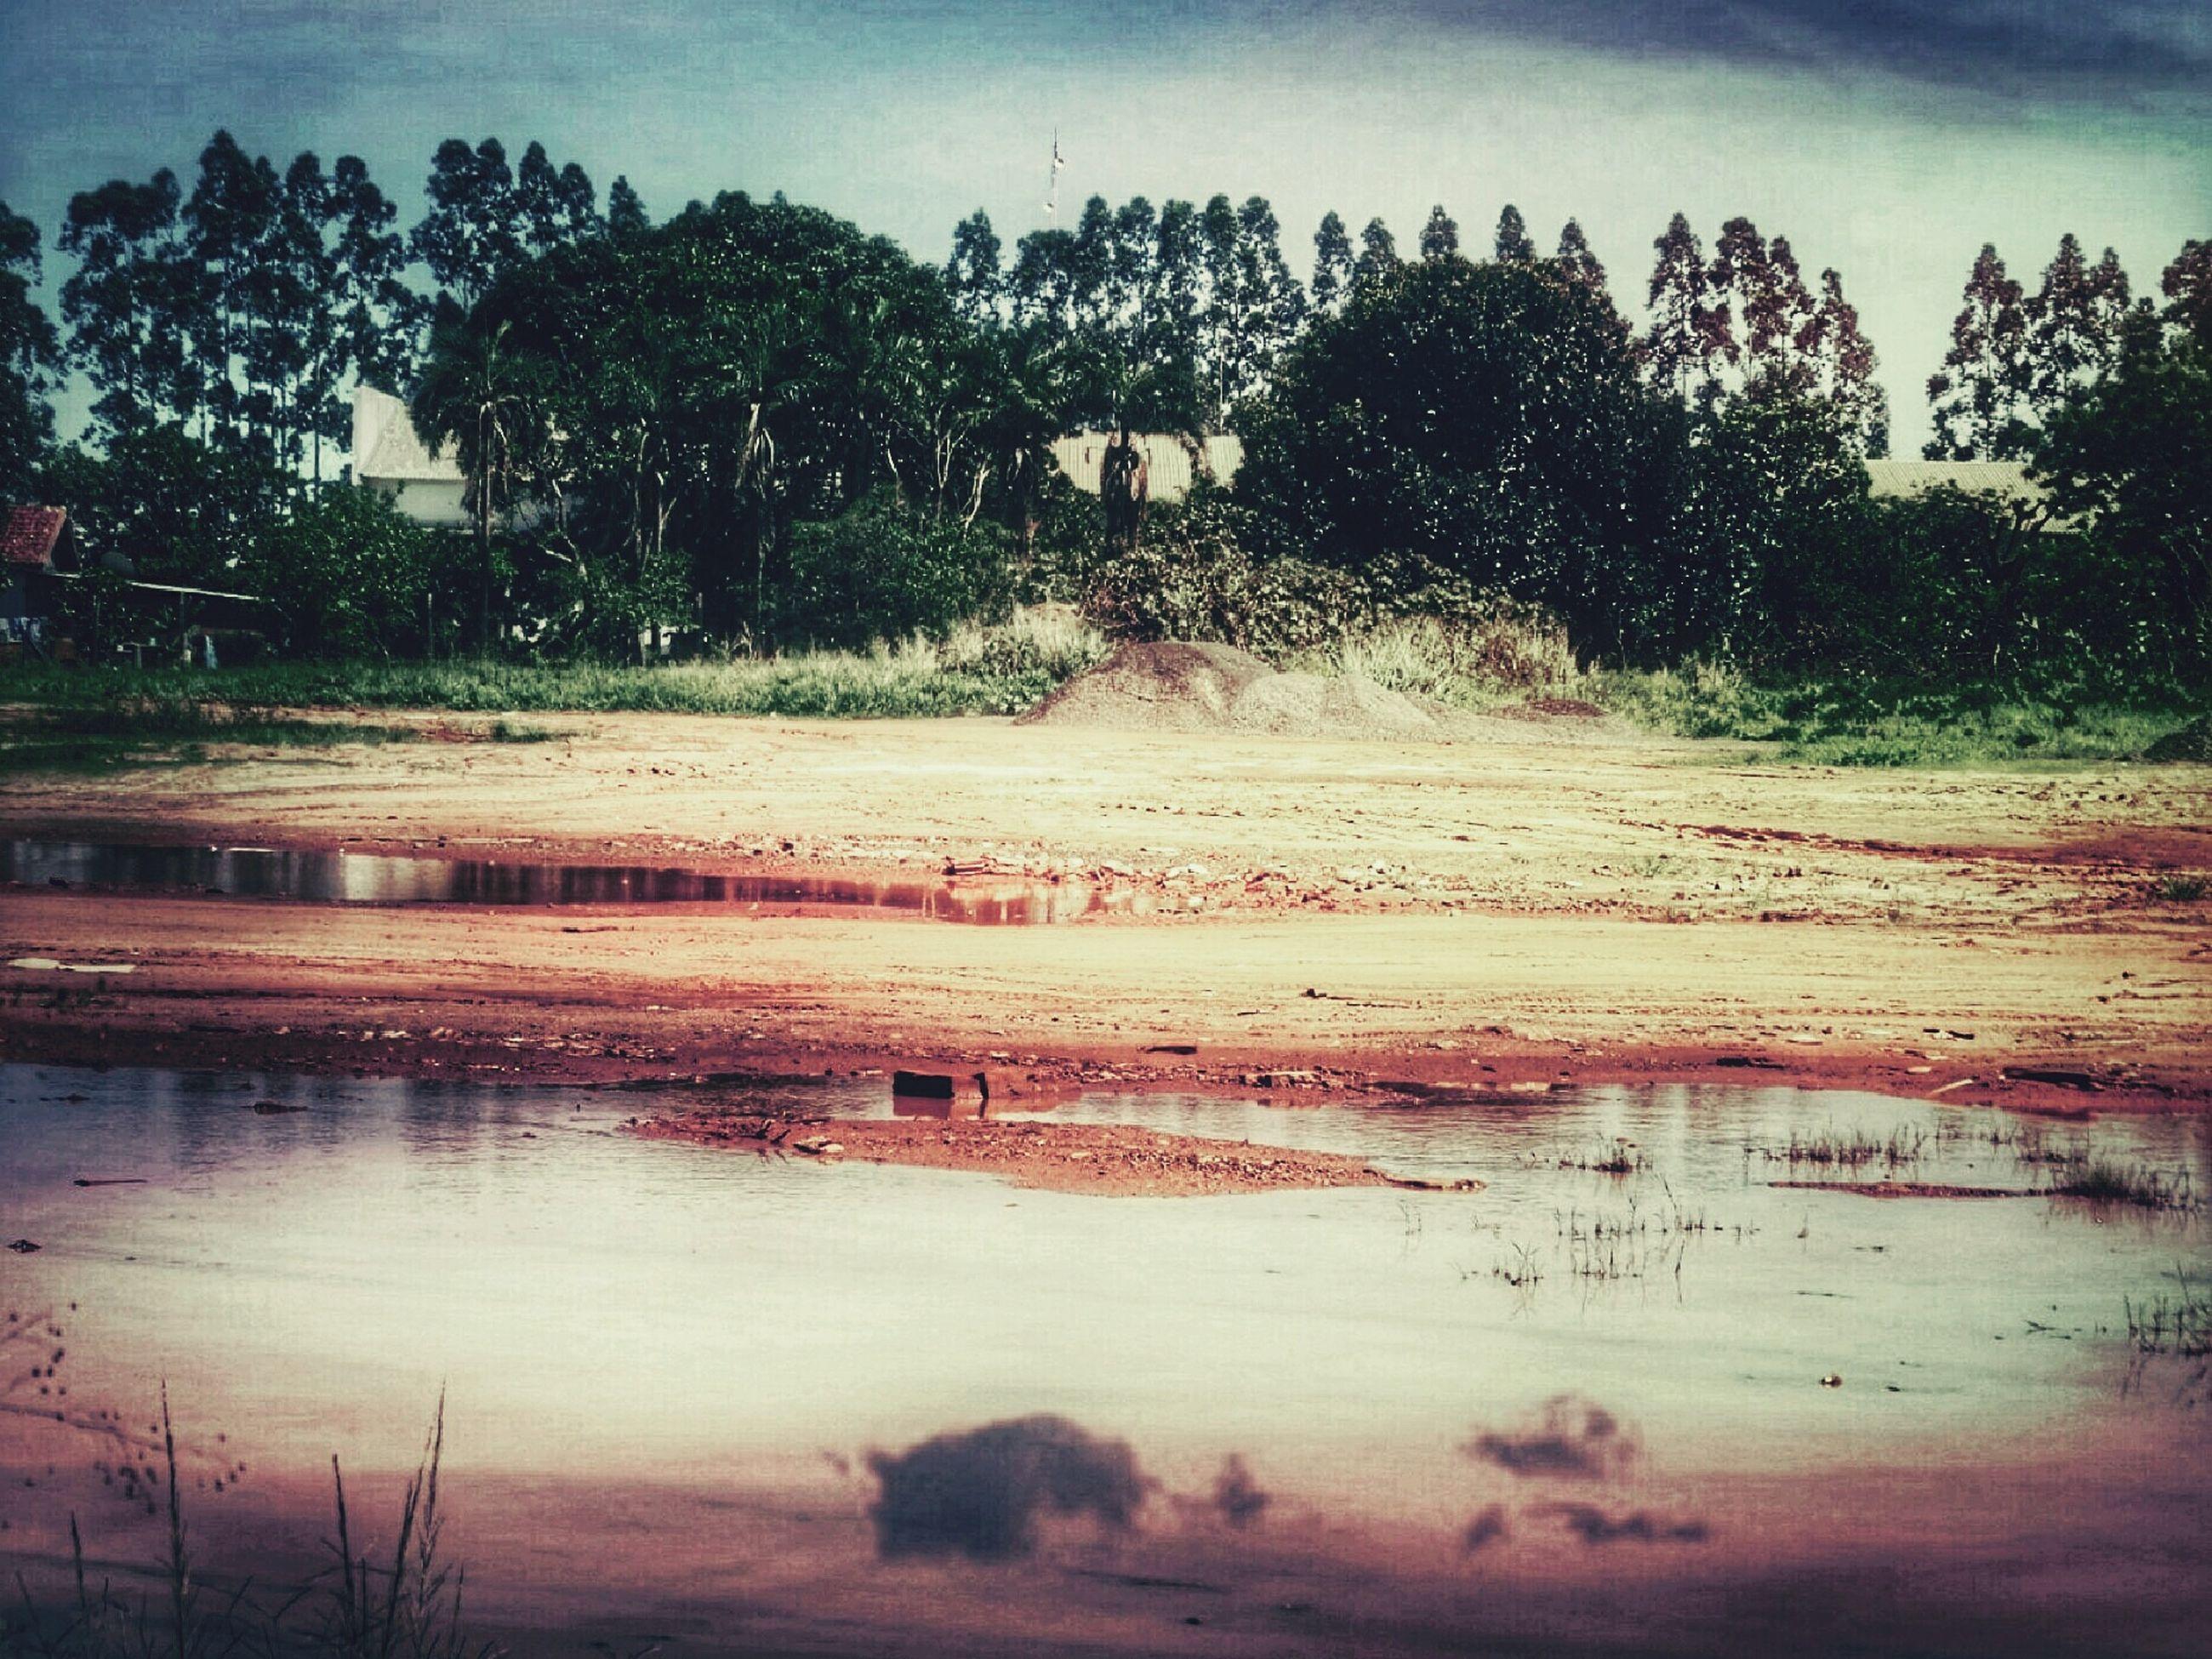 reflection, water, tree, nature, sky, outdoors, day, no people, palm tree, wet, rainy season, lake, scenics, rainfall, beauty in nature, close-up